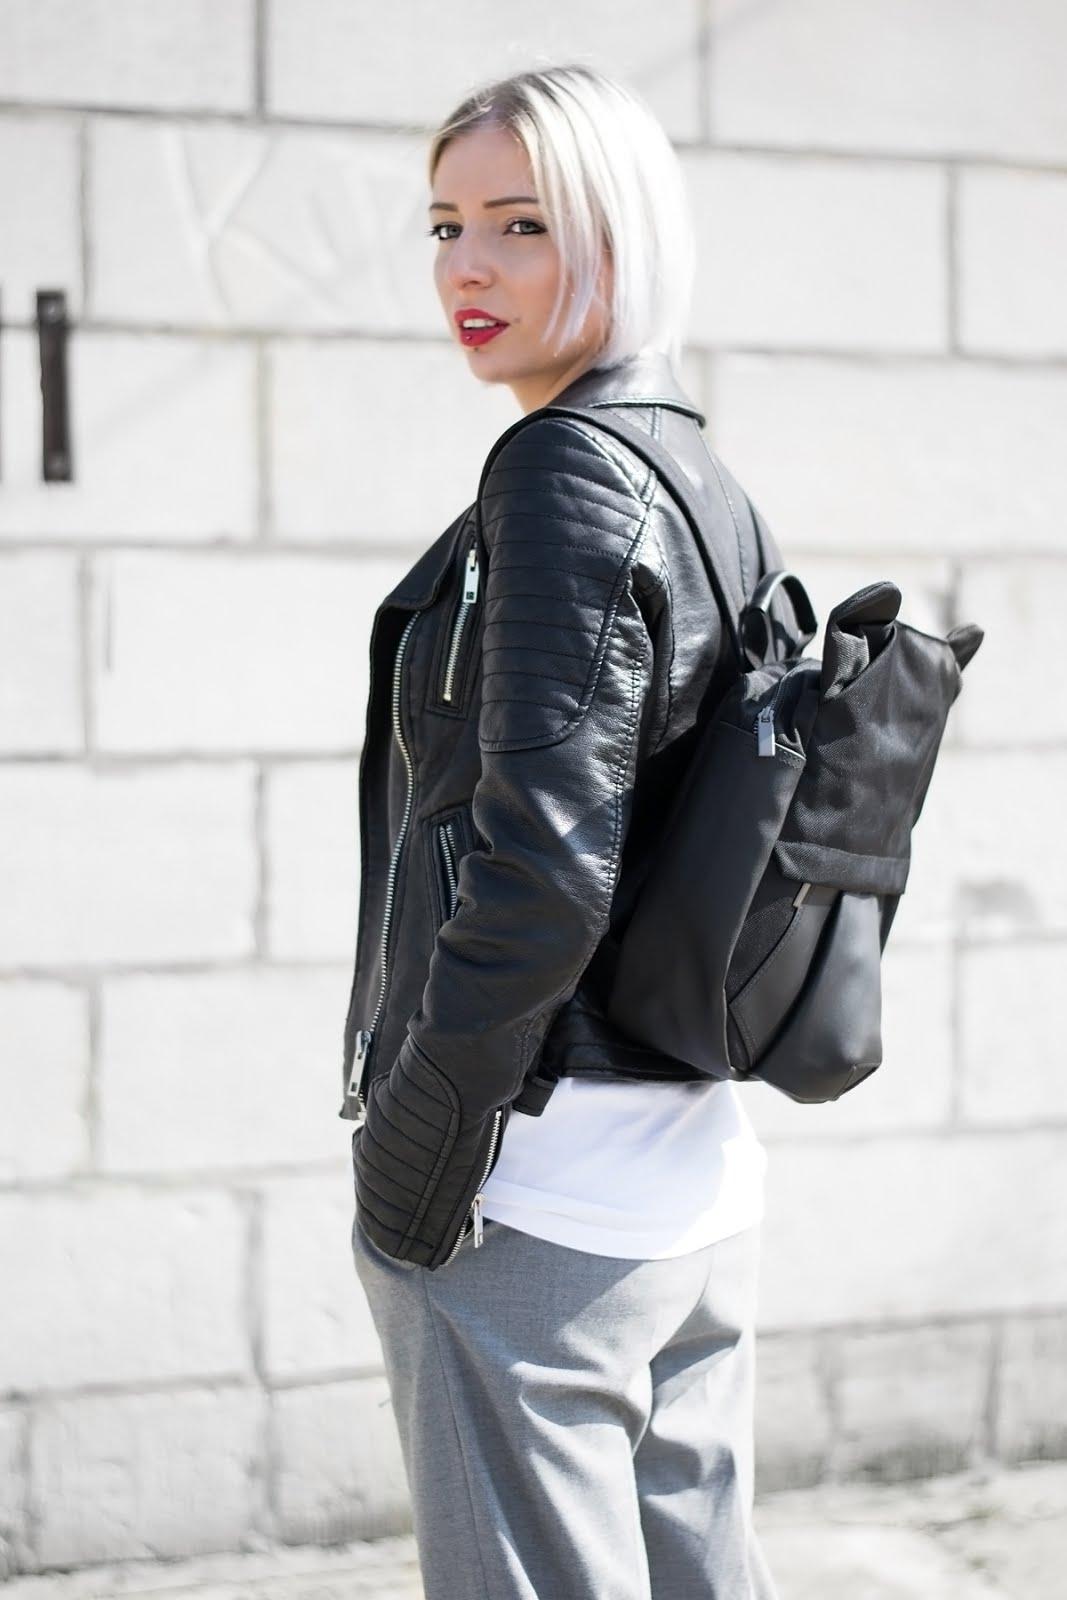 25togo, oribagu, bear backpack, outfit, grey culottes, adidas logo tshirt, tango, creepers, emma, minimal, SS17